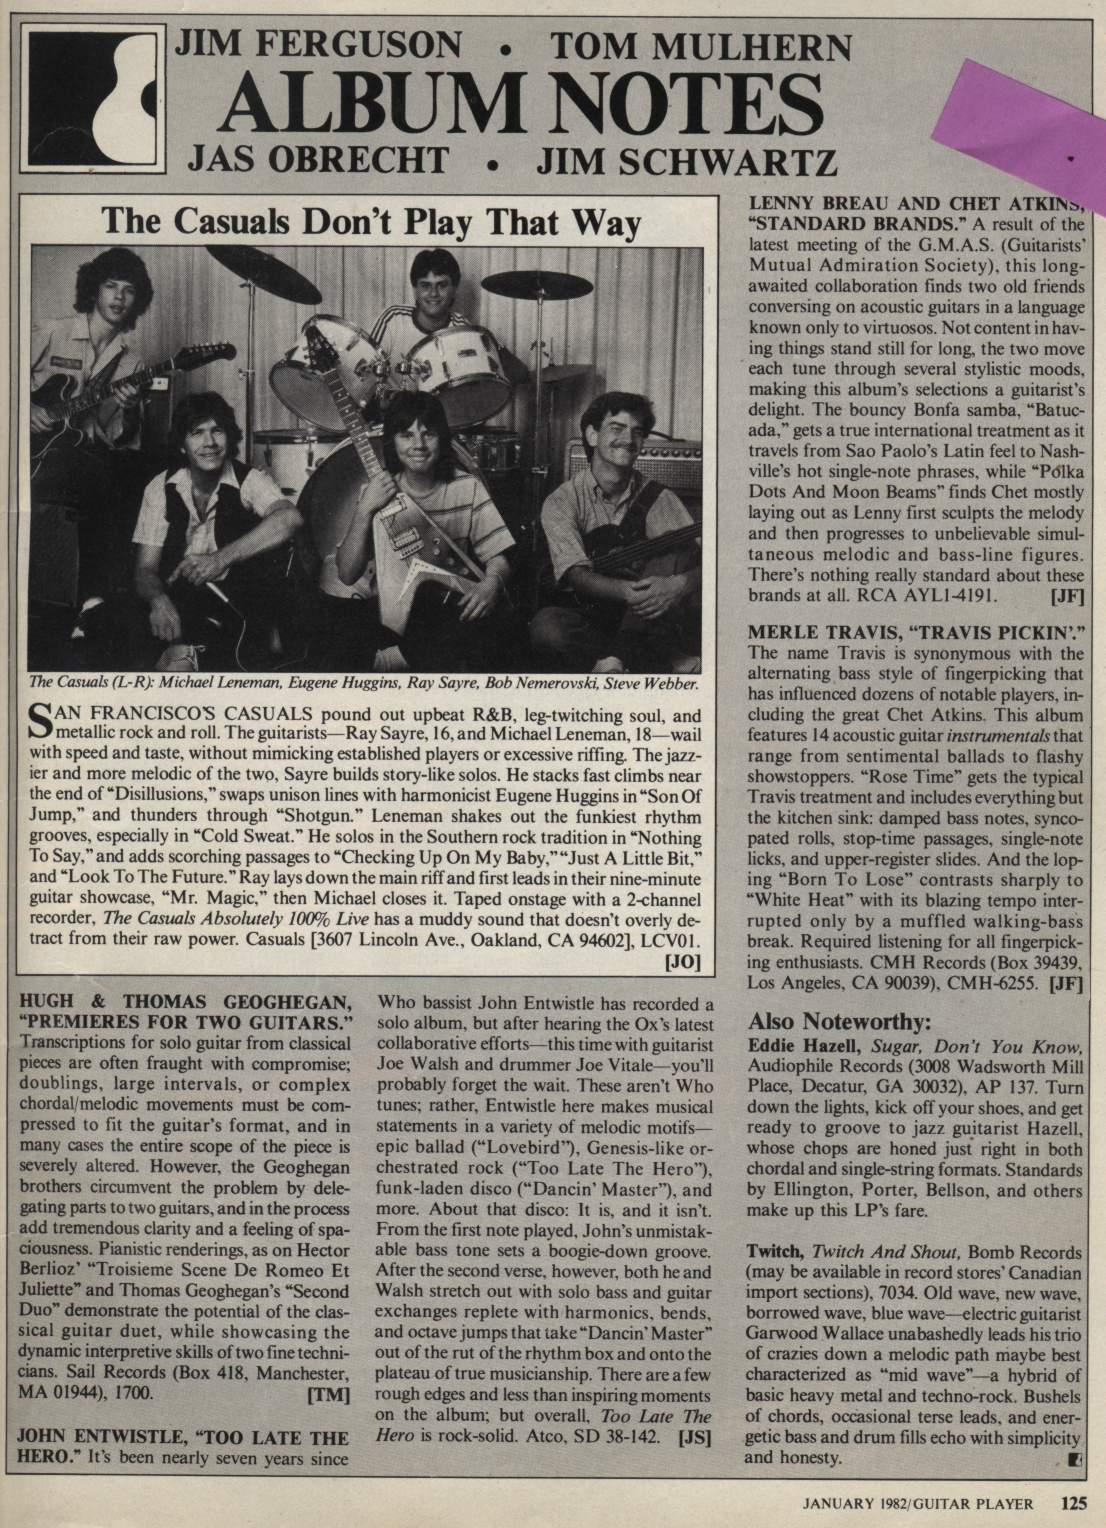 Guitar Player Magazine Review, The Casuals Album